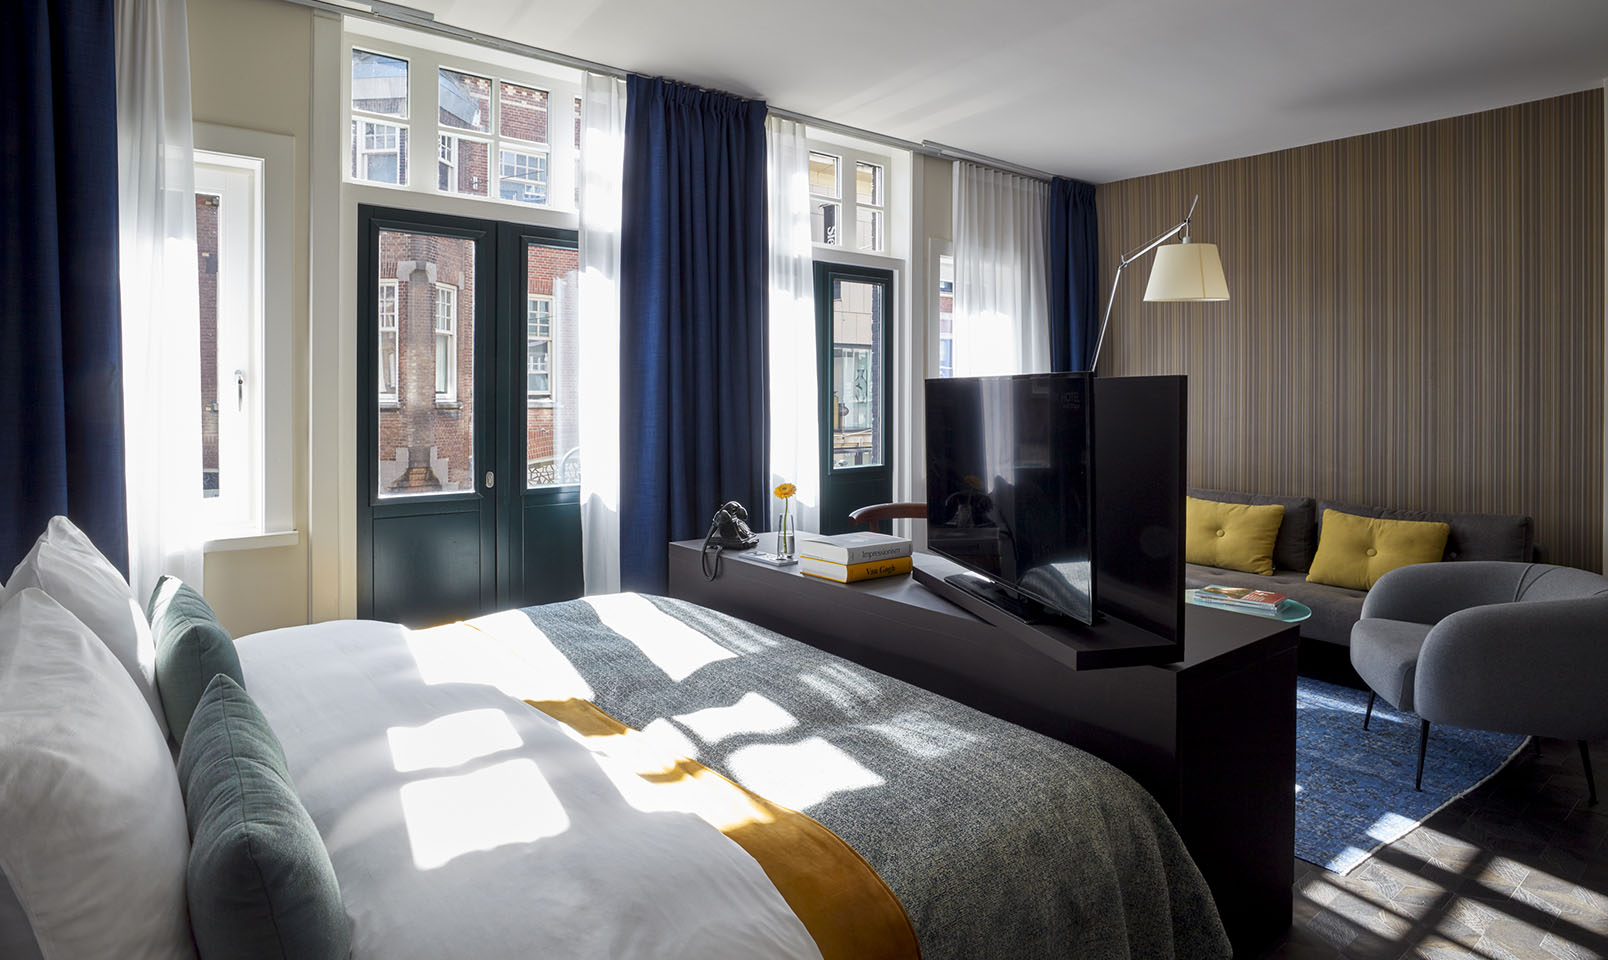 park-centraal-amsterdam-room